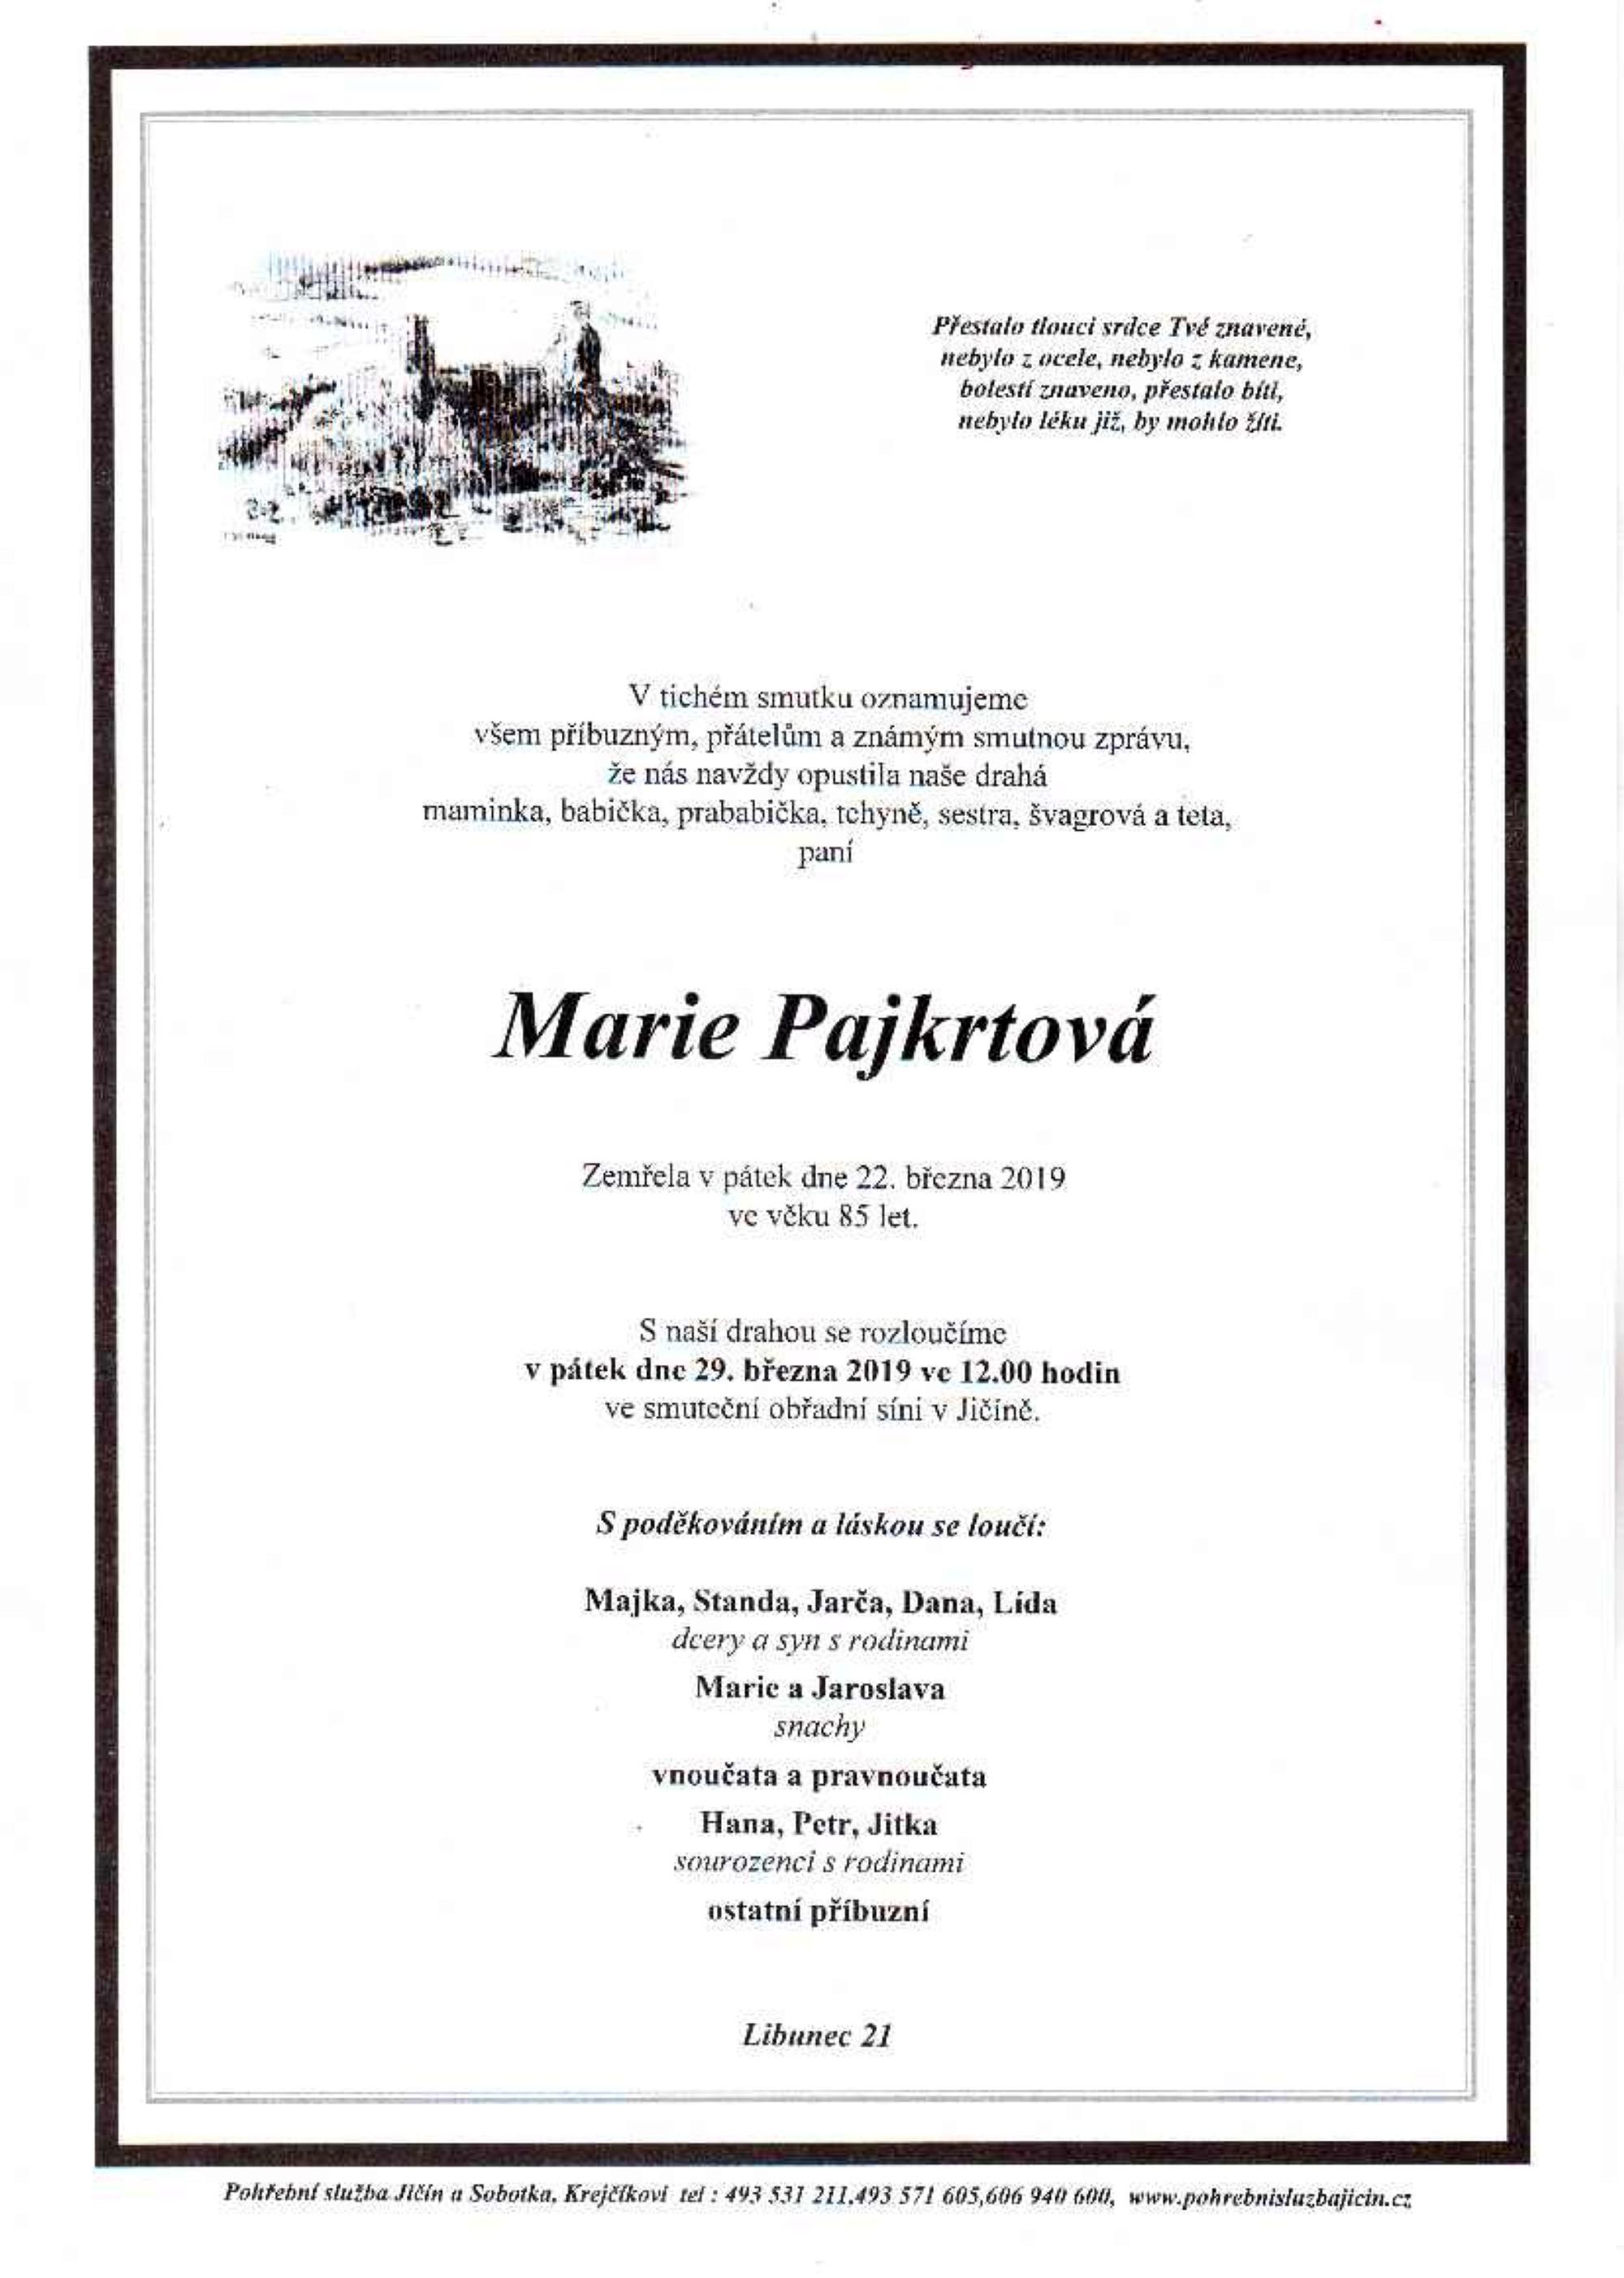 Marie Pajkrtová